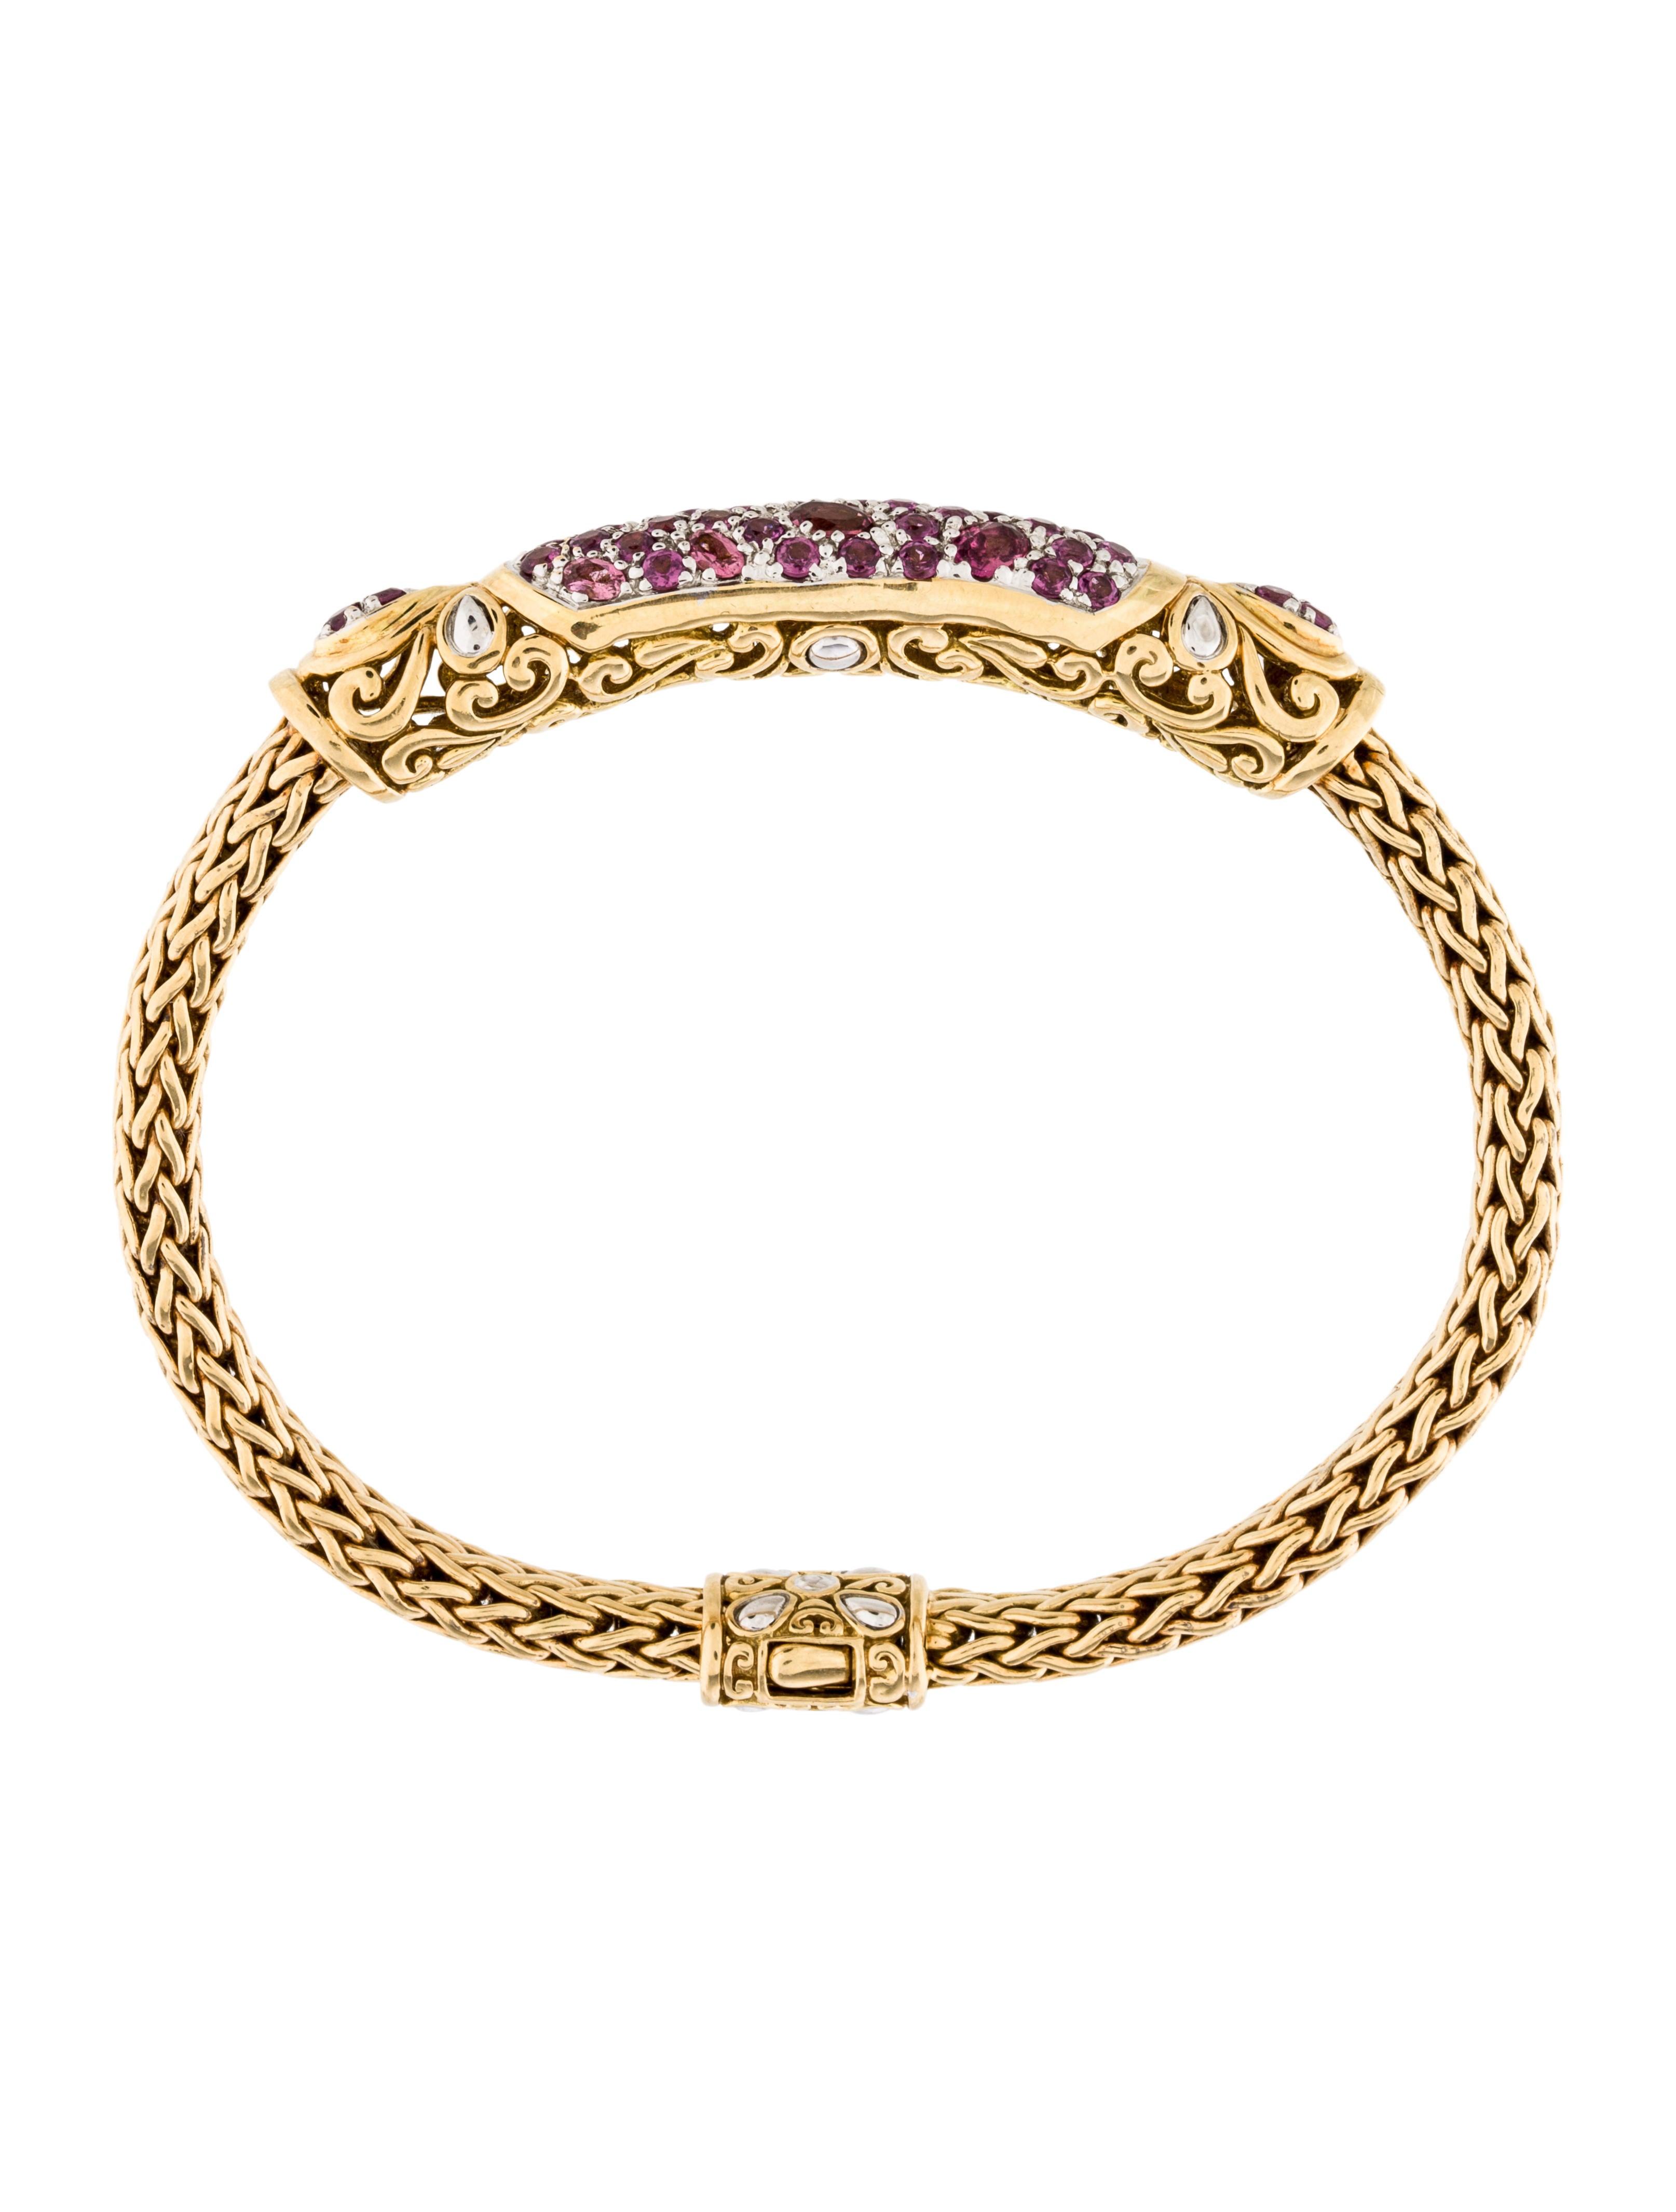 John Hardy Pink Tourmaline Classic Chain Bracelet